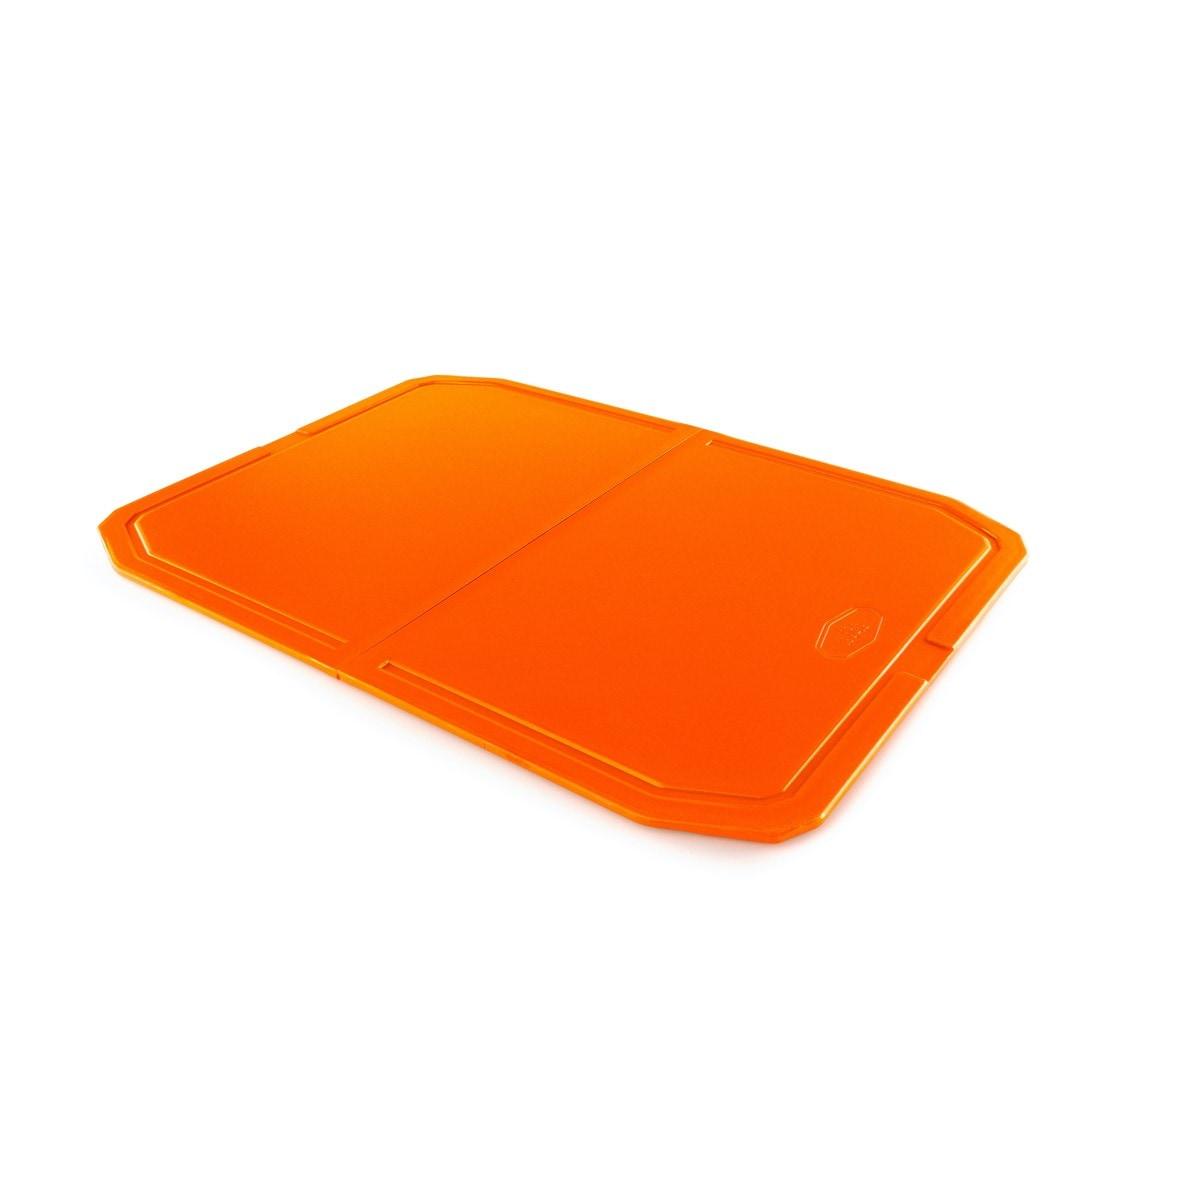 GSI Outdoors Folding Cutting Board